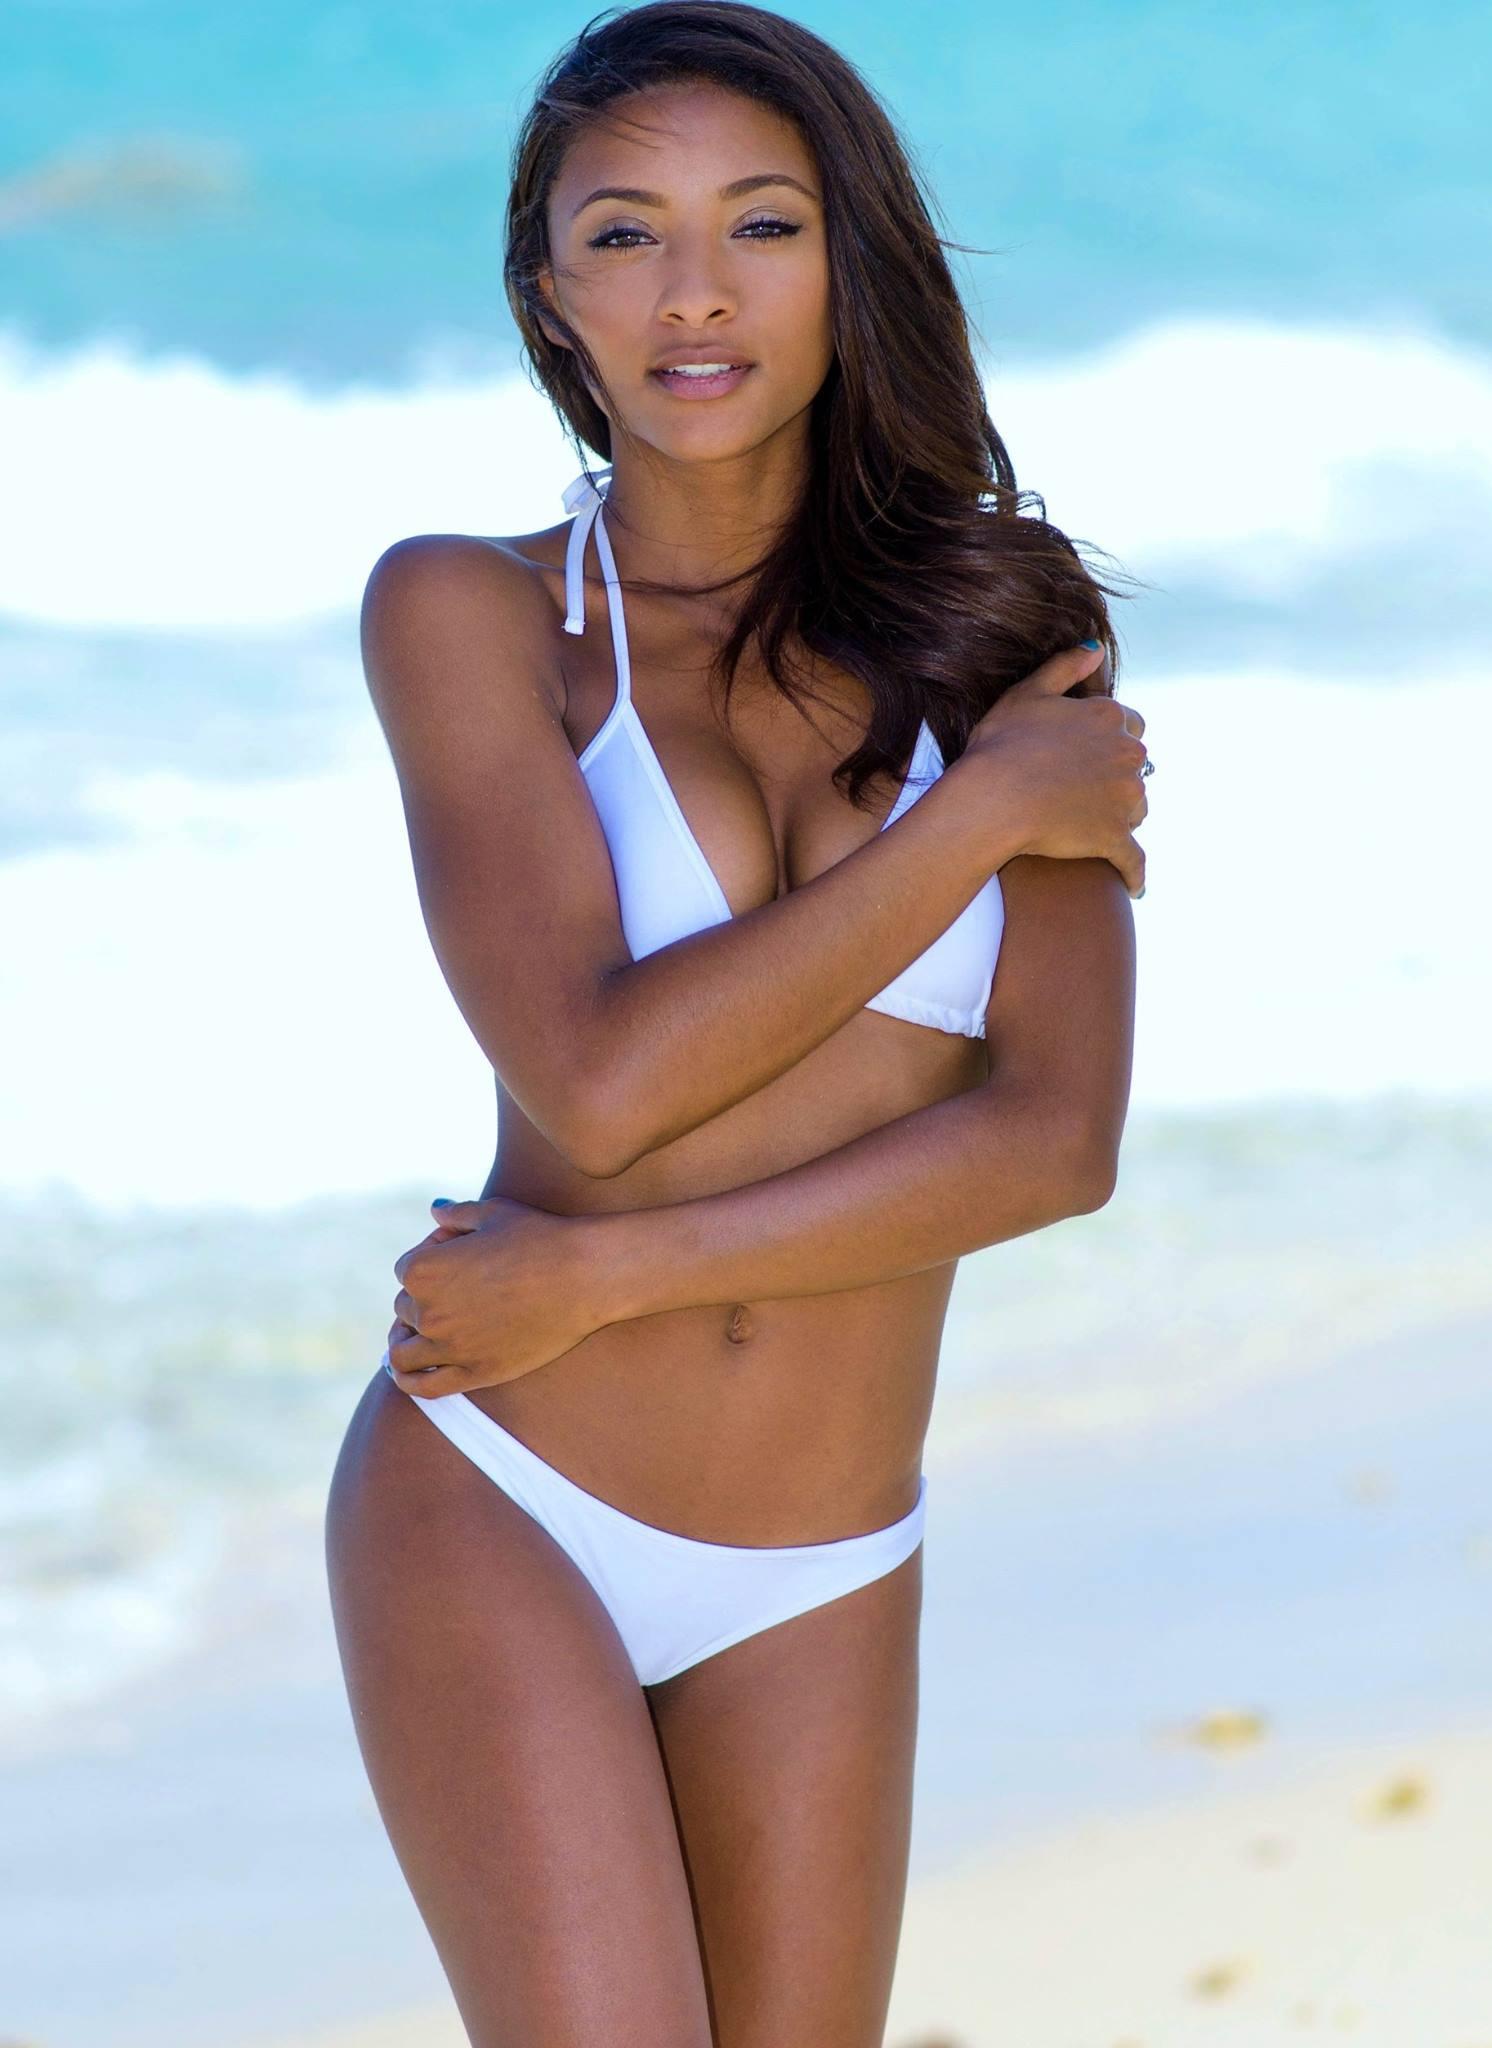 miami-beach-promo-models